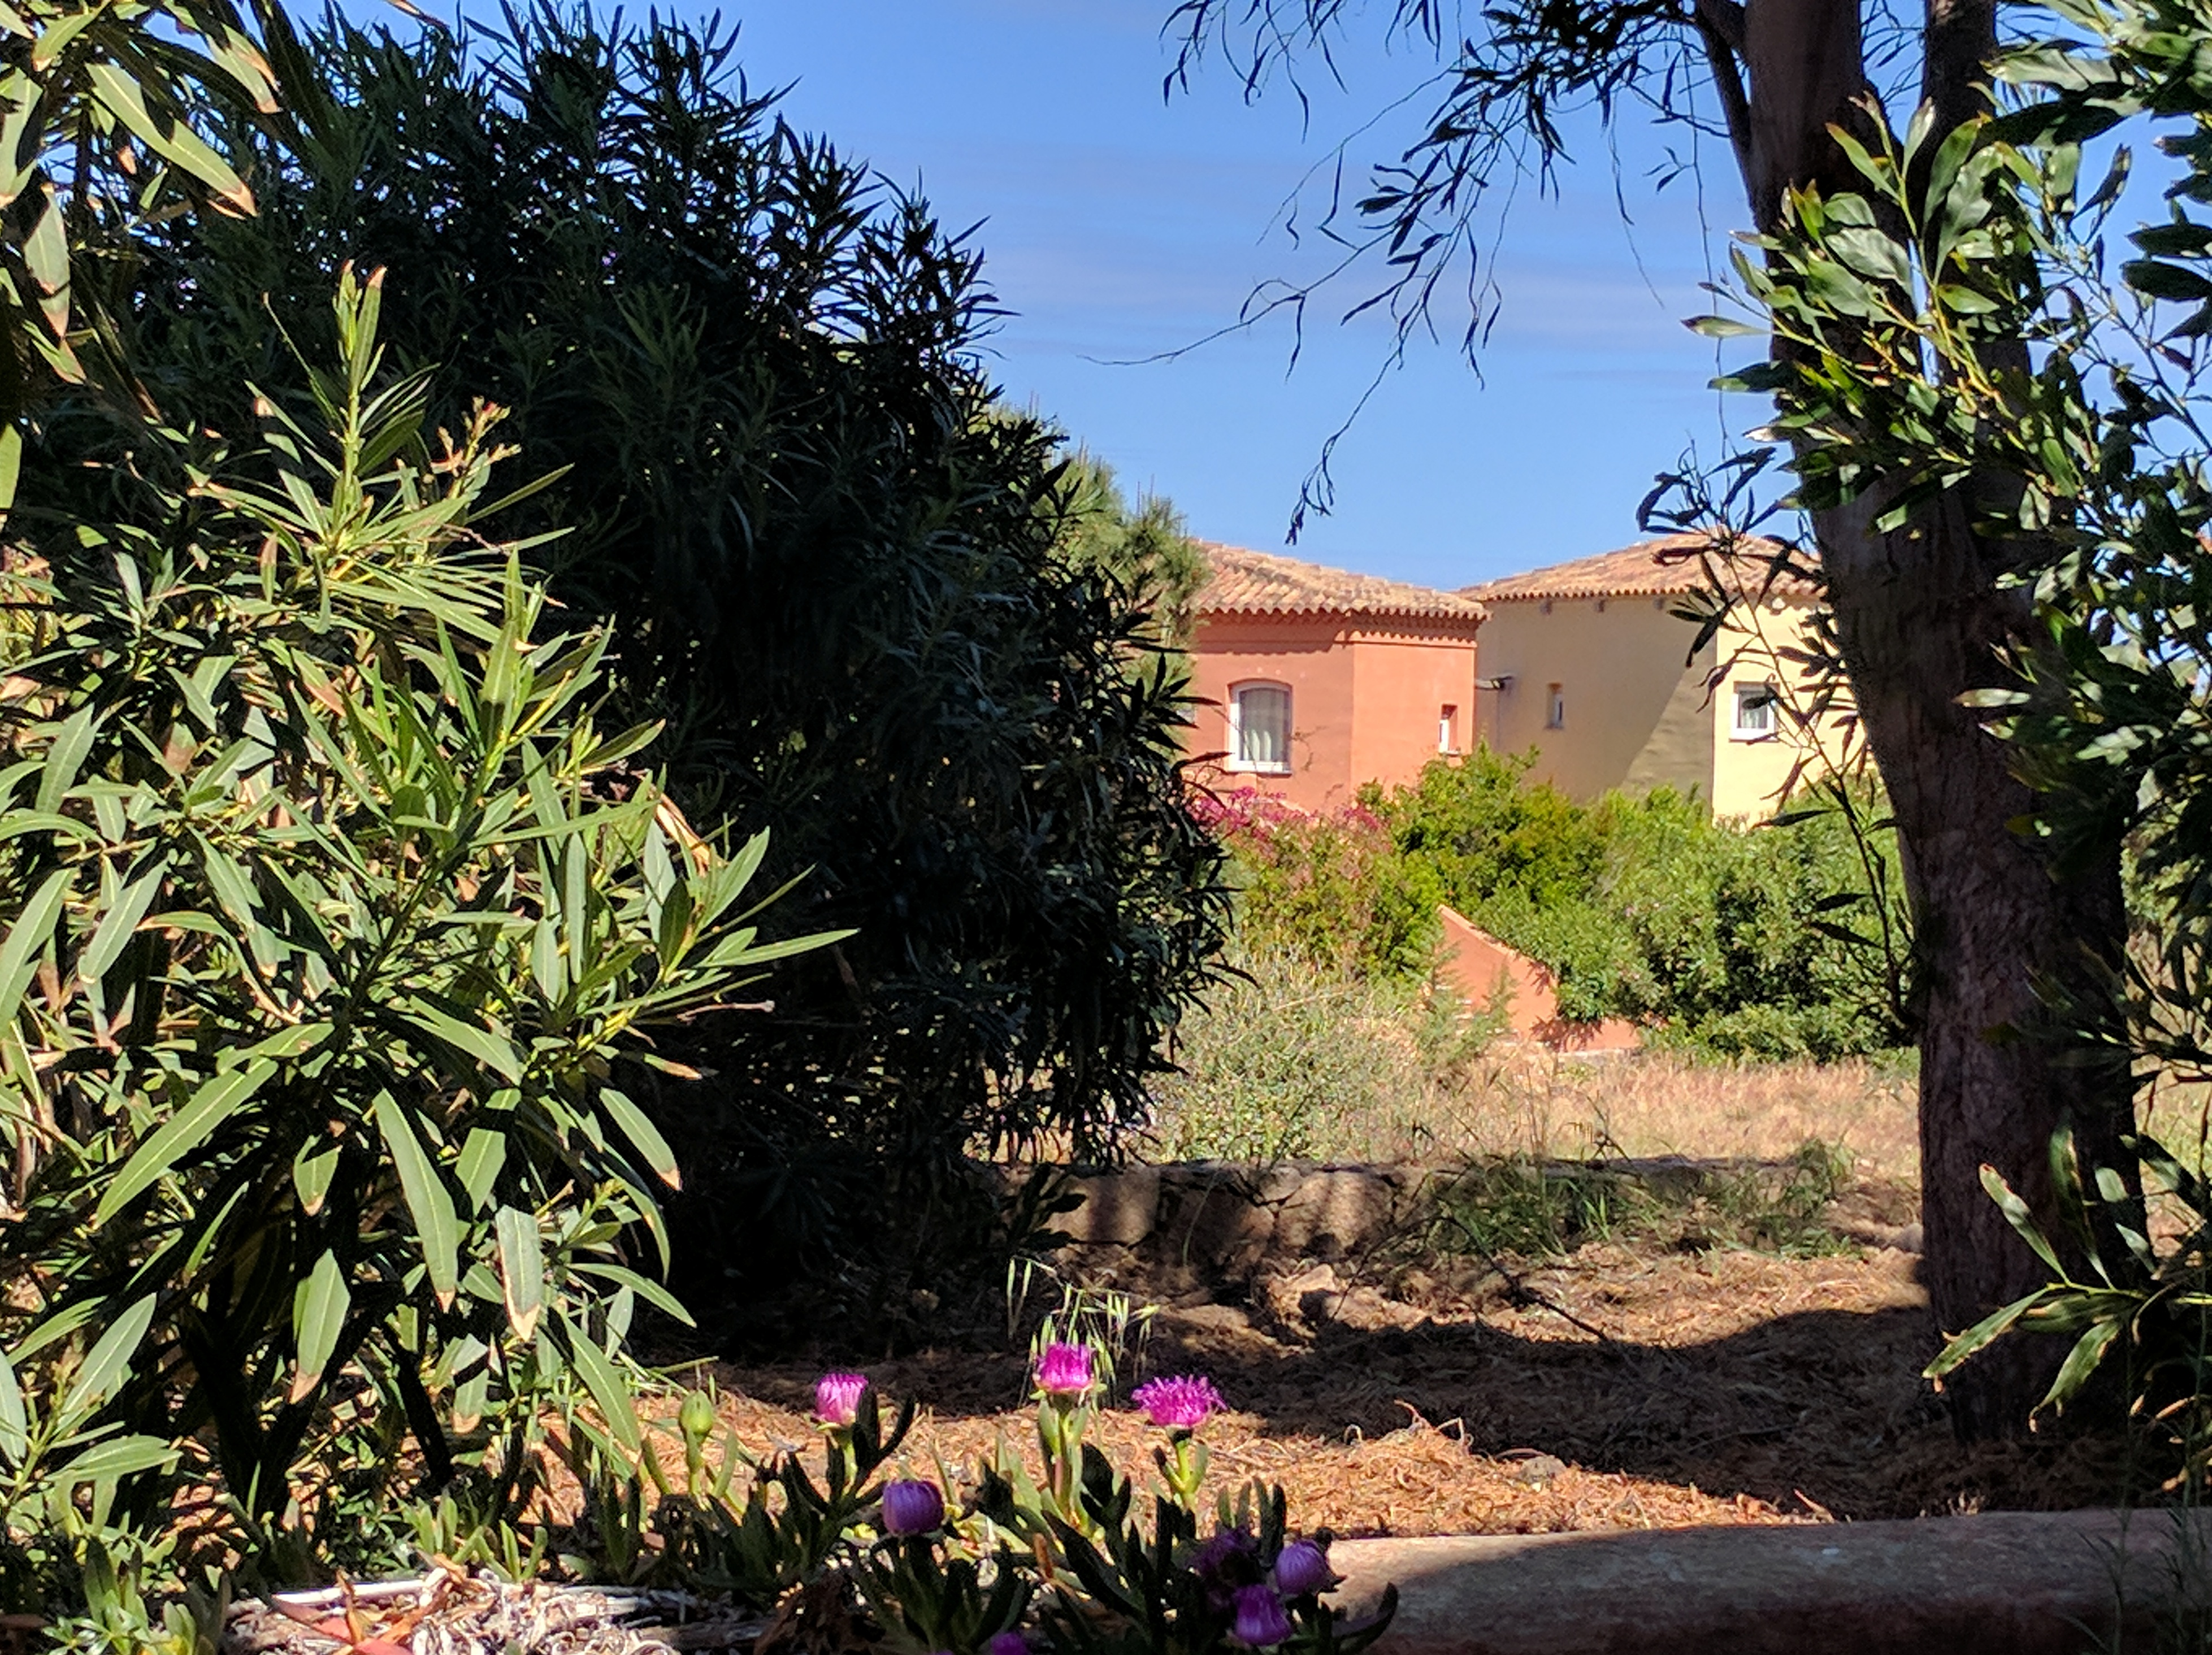 Ferienwohnung Cottage-Apartment On The Coast Surrounded By Unspoilt Nature (2230692), Canneddi, Olbia-Tempio, Sardinien, Italien, Bild 5